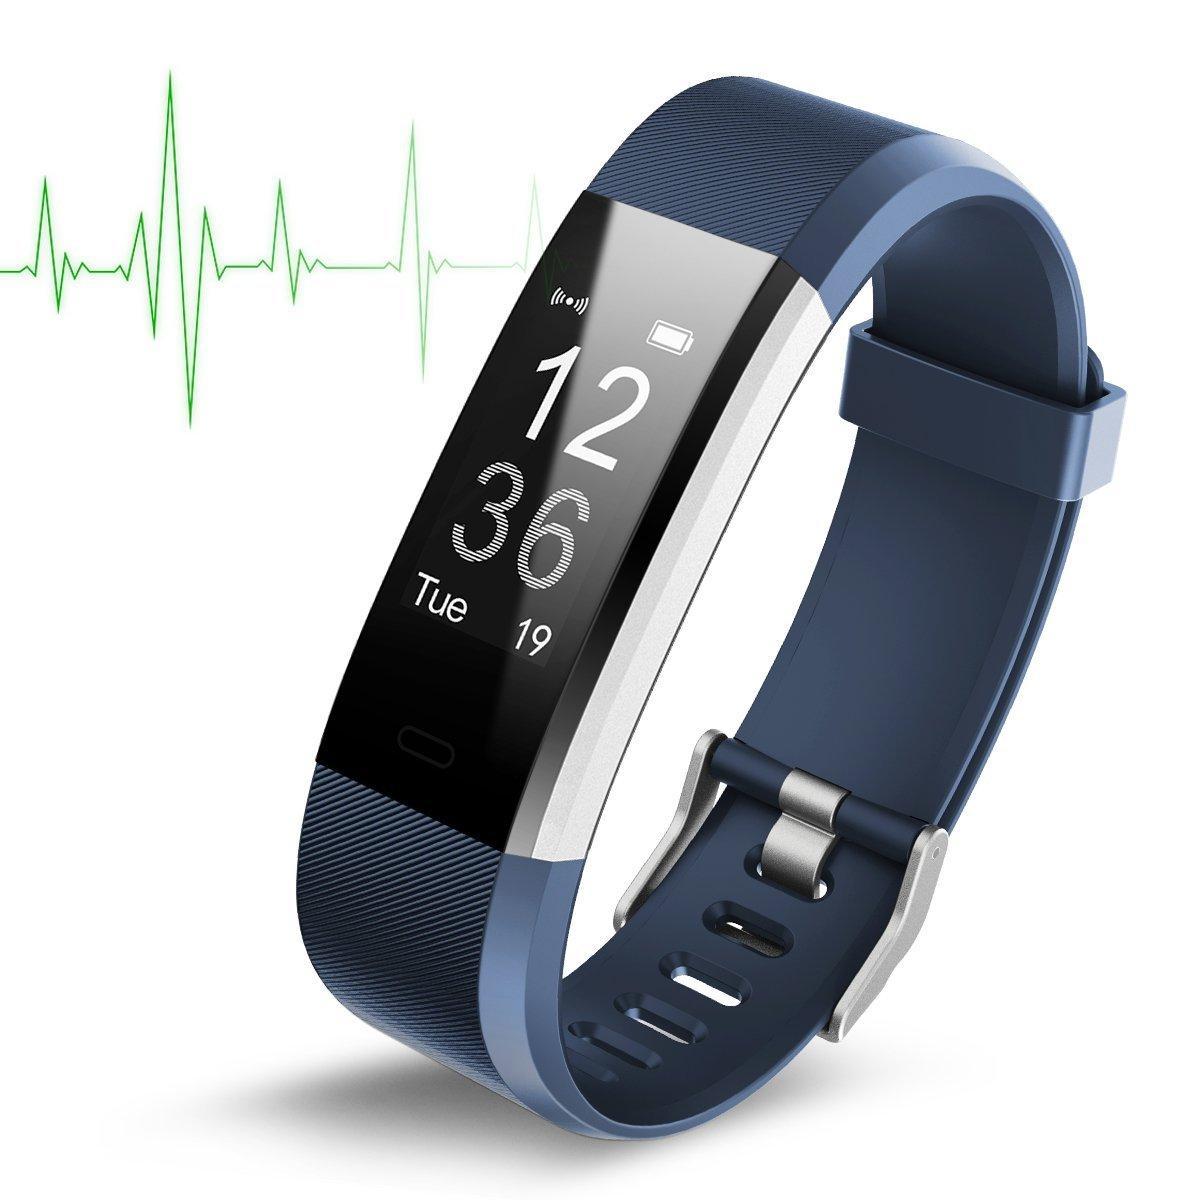 ID115 Plus Smart Wristband Sports Heart Rate Smart Band Fitness Tracker Smart Bracelet Smart Watch for